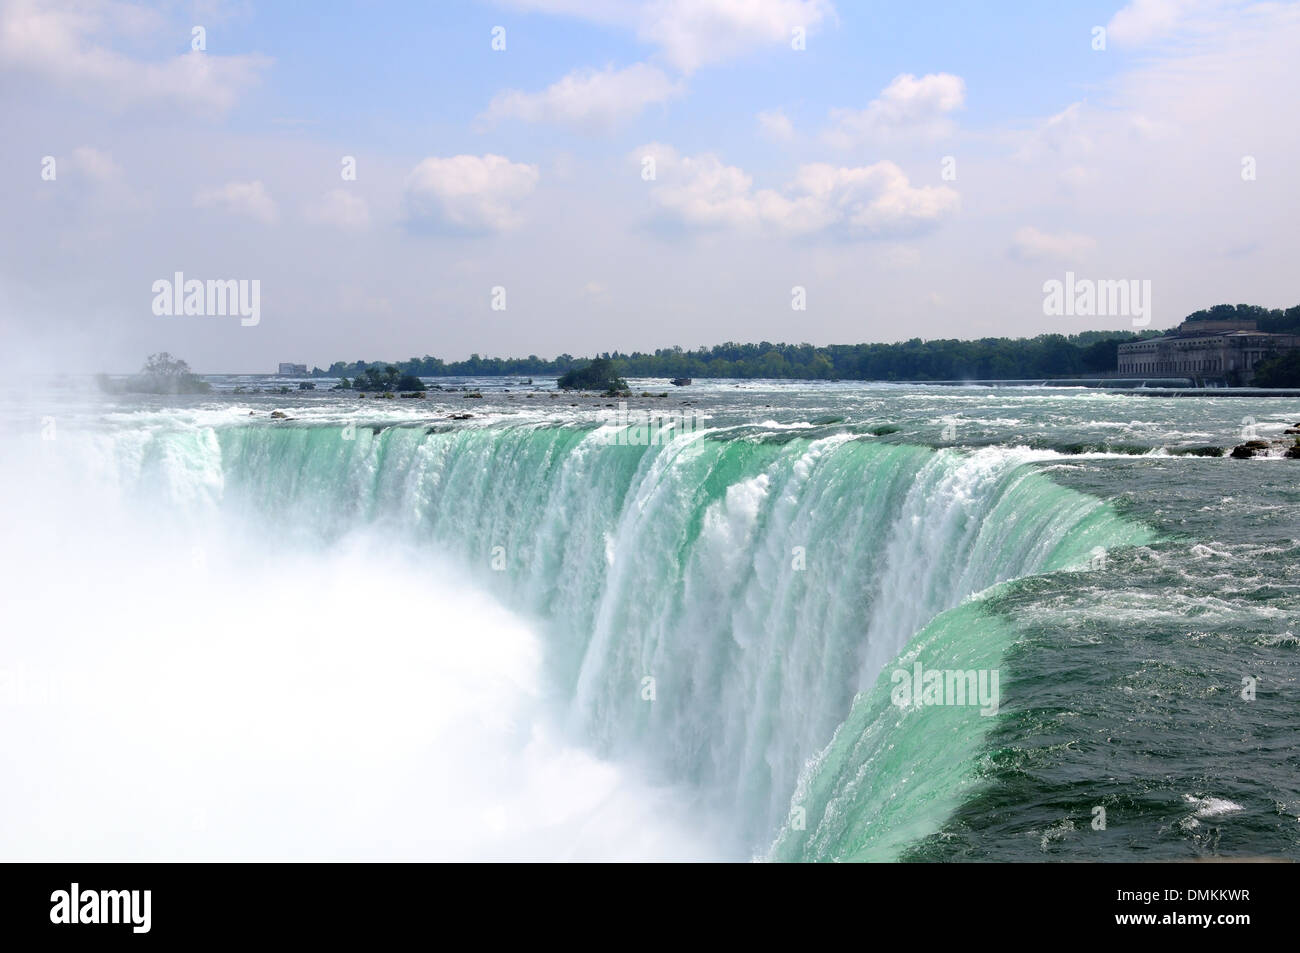 The edge of Niagara Falls, Canada - Stock Image